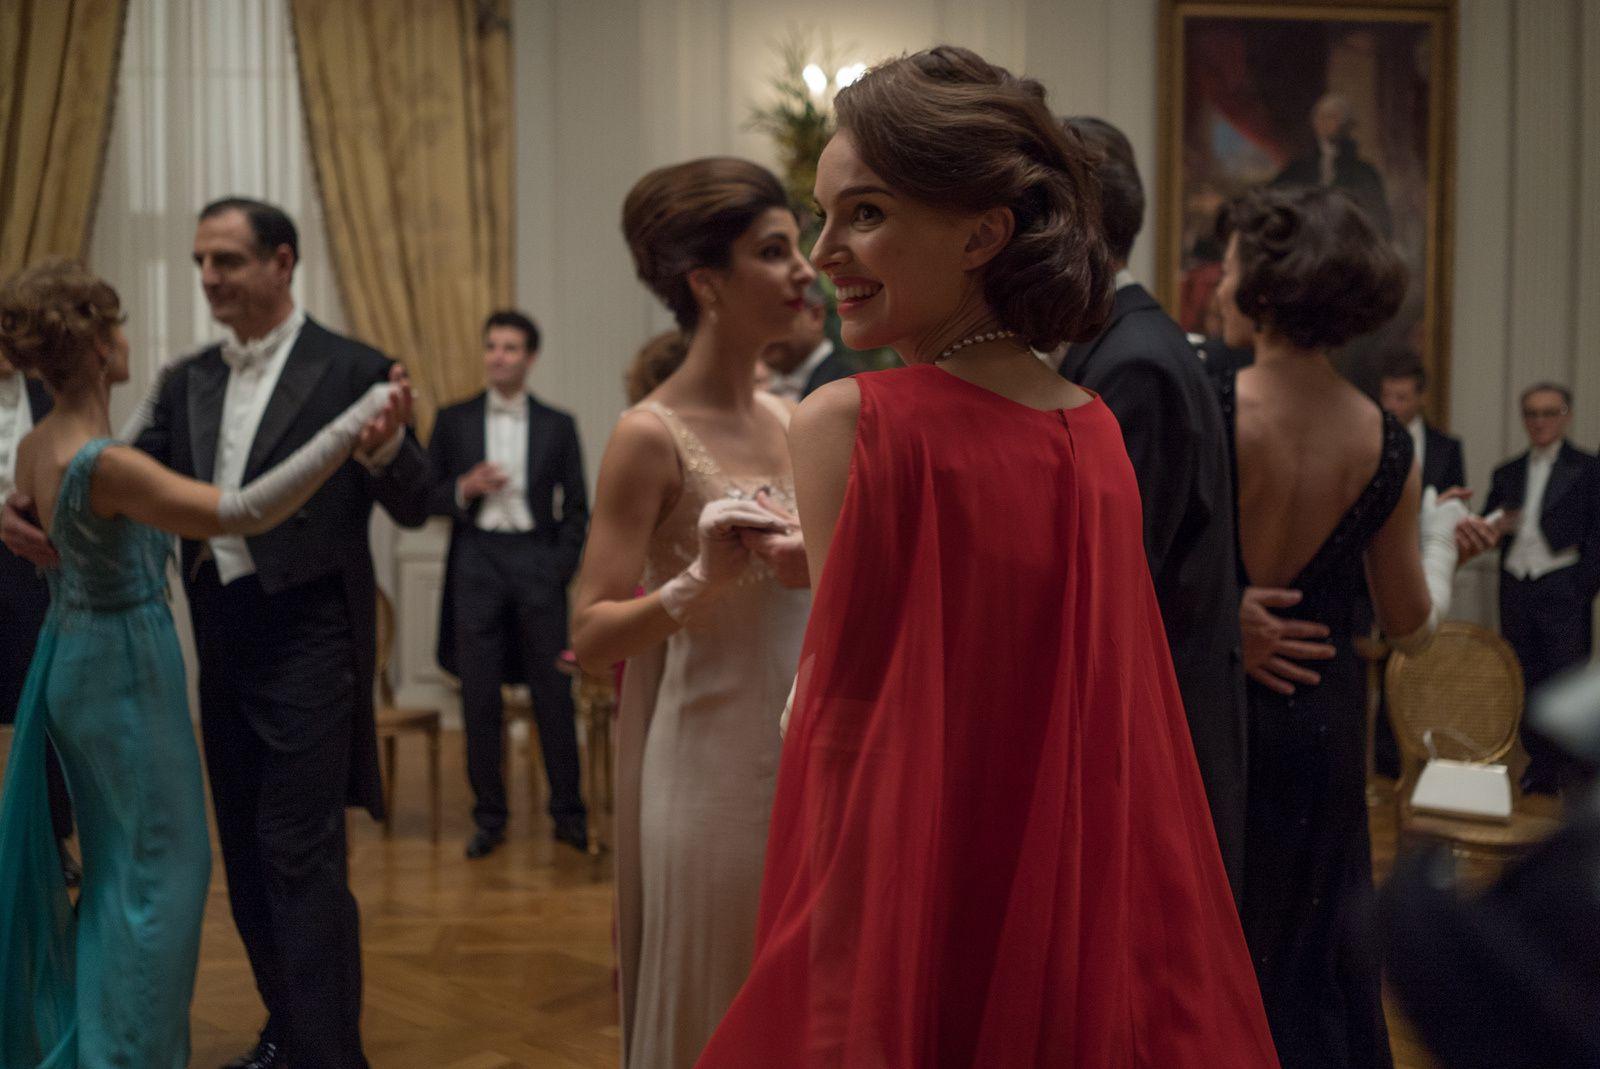 Jackie (BANDE ANNONCE VOST) avec Natalie Portman, Peter Sarsgaard, Greta Gerwig - Le 1er février 2017 au cinéma